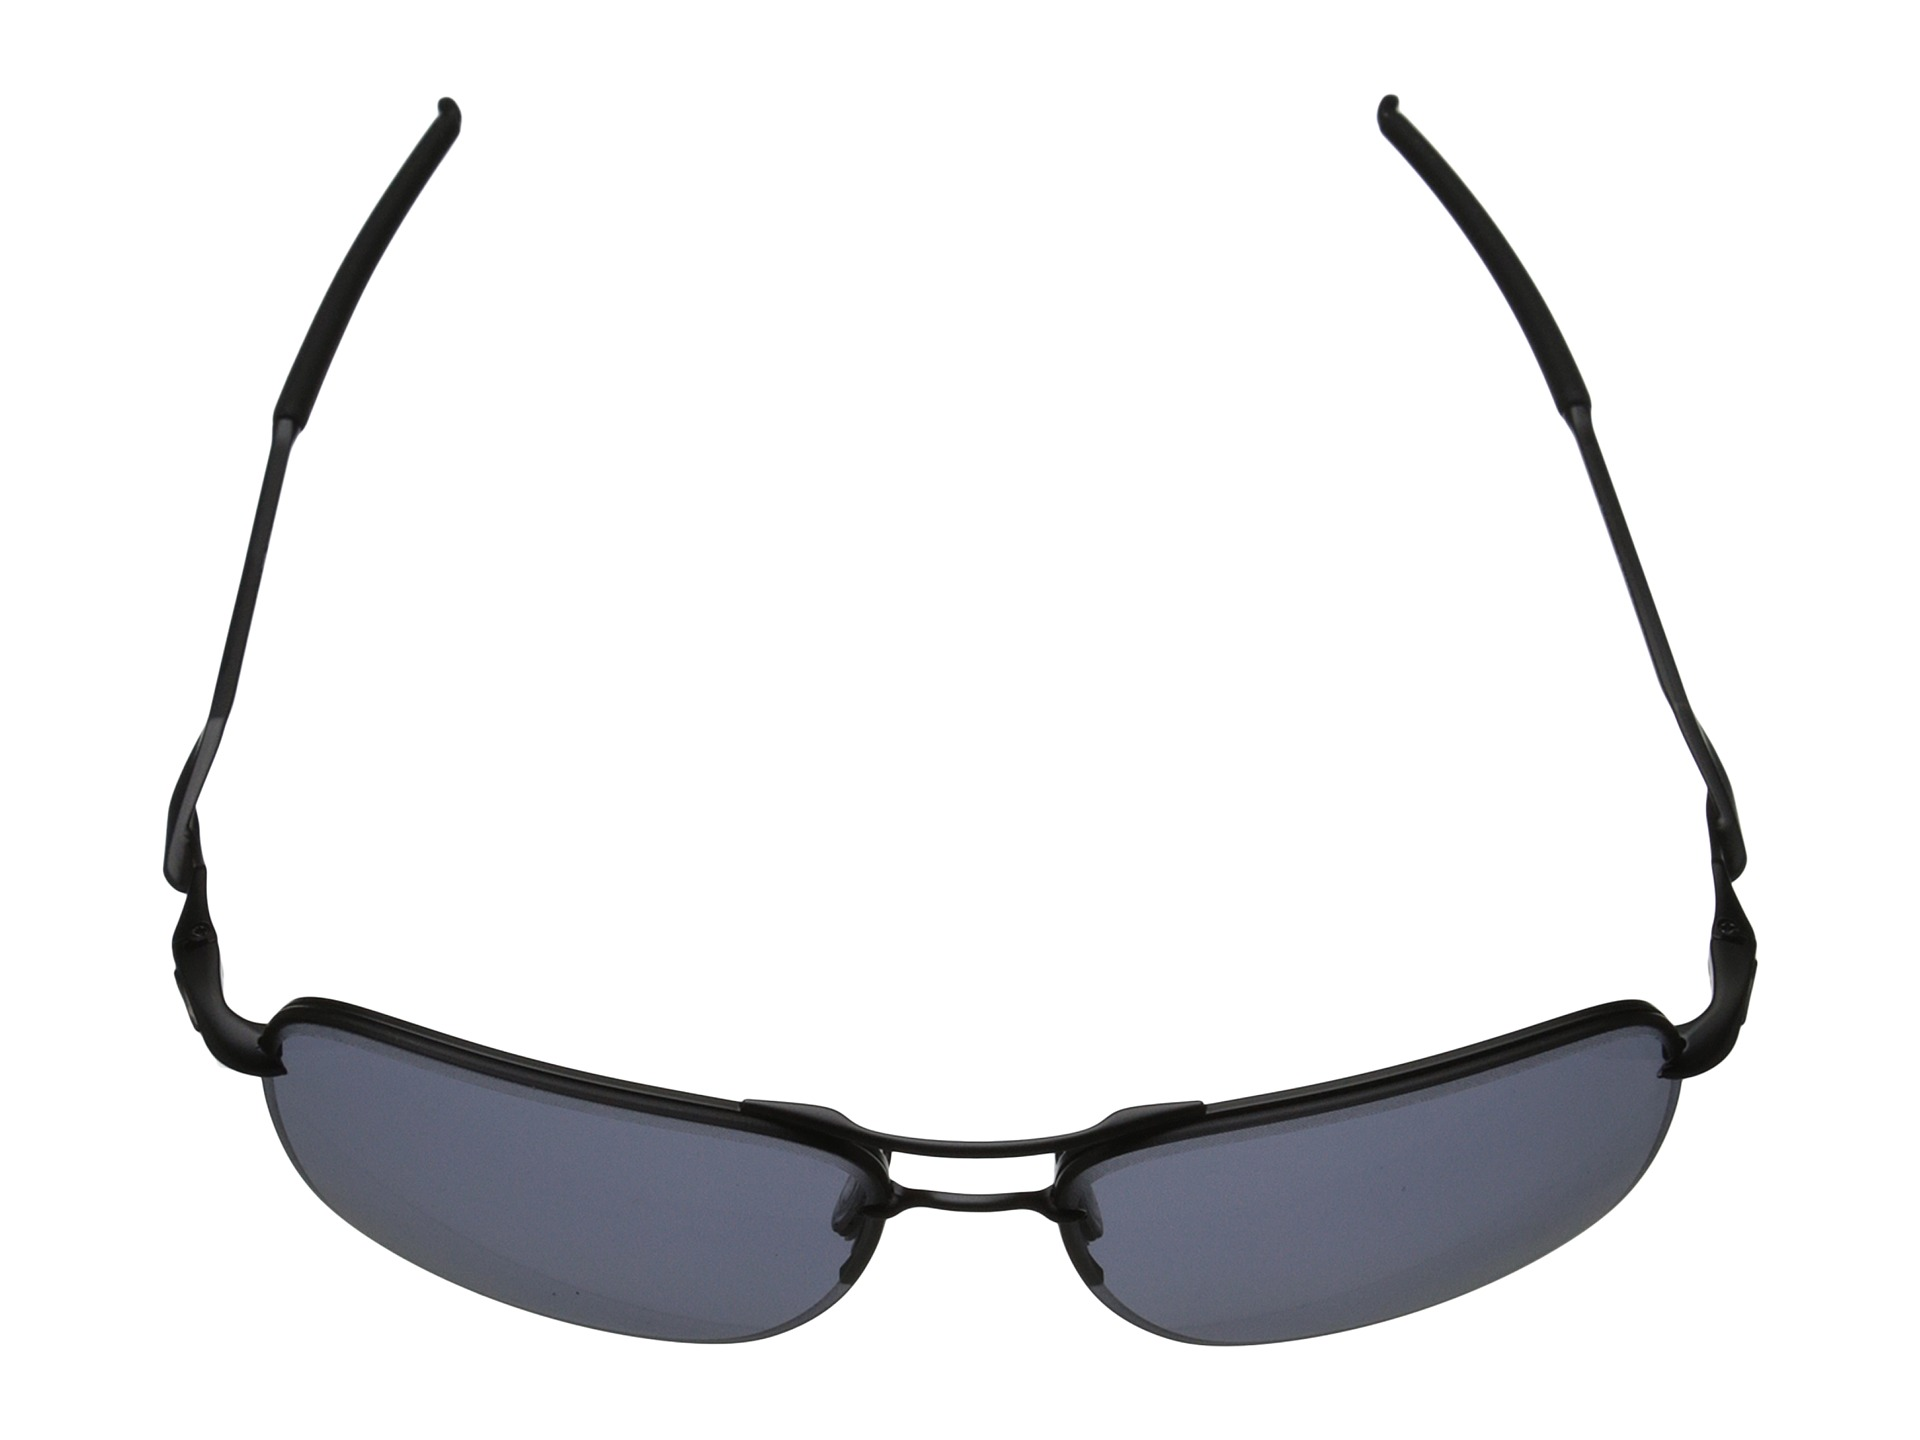 77082d7b7a Oakley Wire Frame Sunglasses Tailhook « Heritage Malta